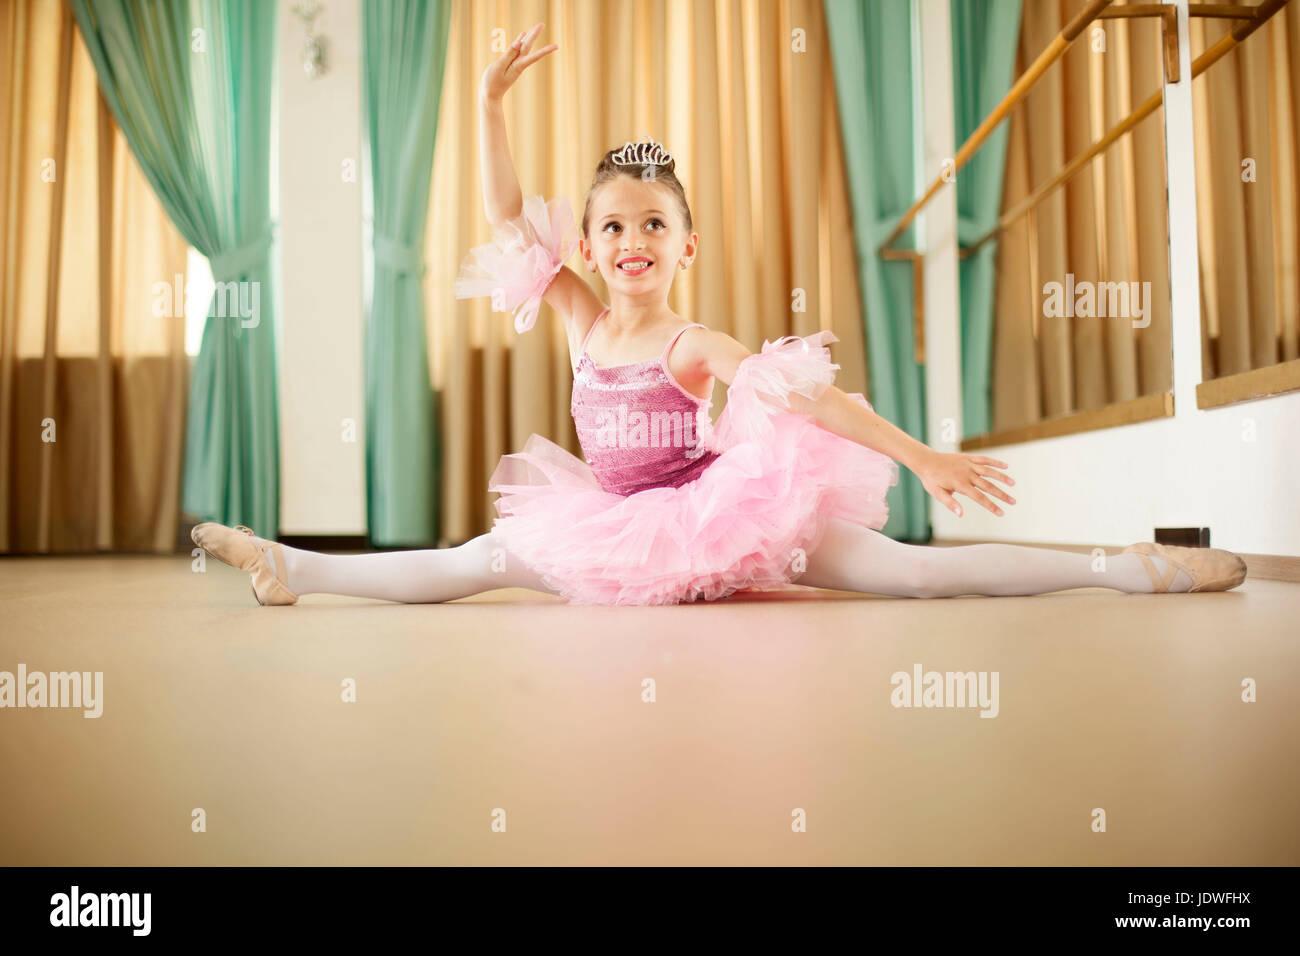 Ballet class - Stock Image